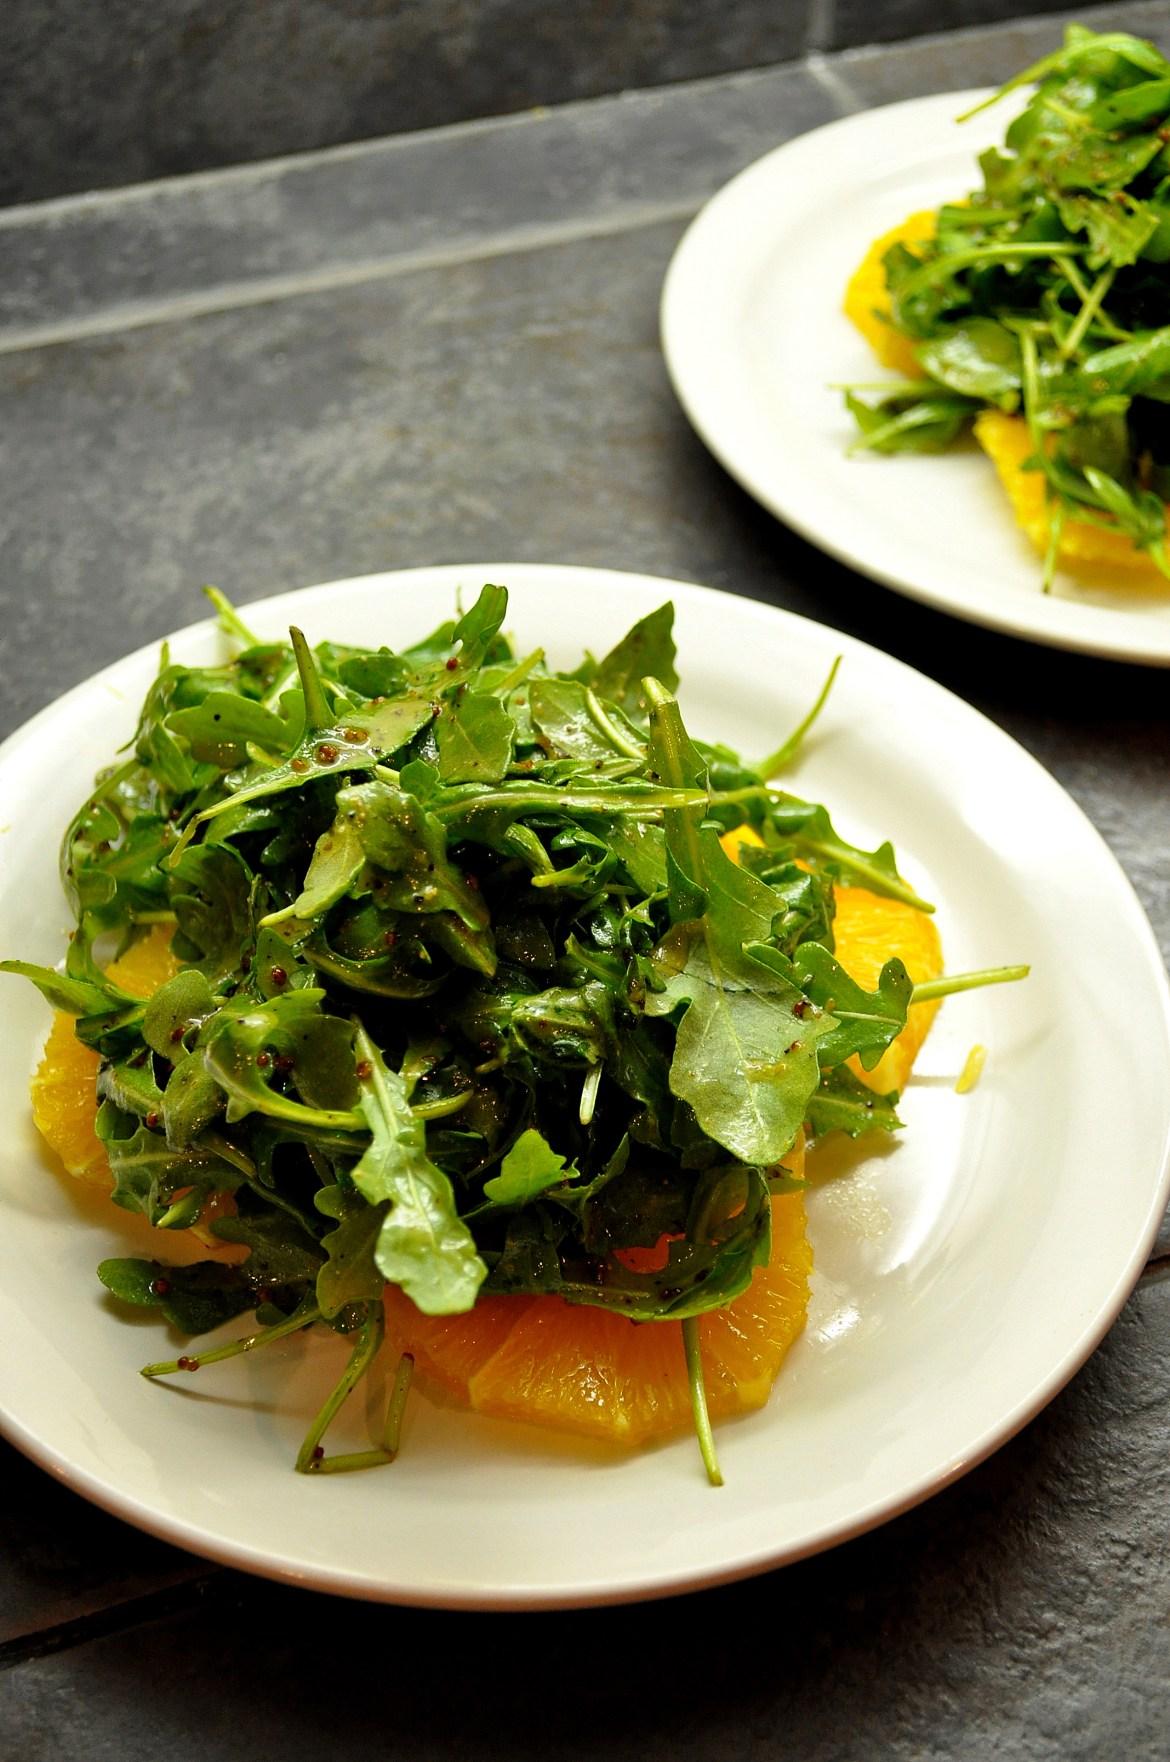 Postmark Chef Kit Review - via farmgirlgourmet.com